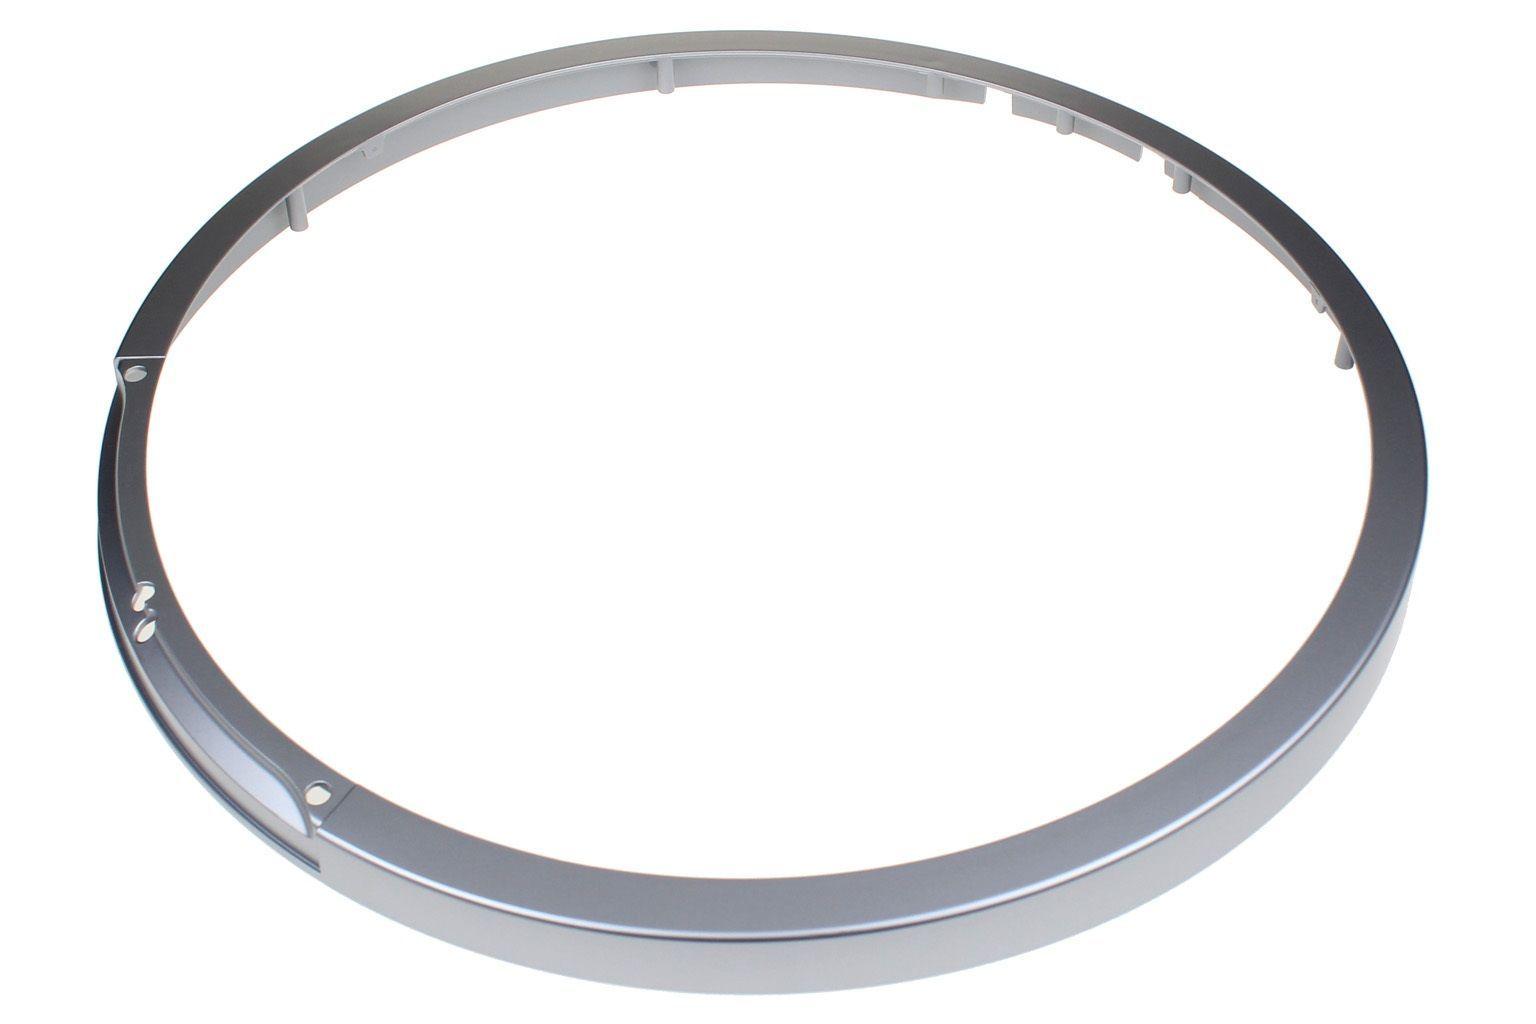 Krytka, plexi dveří do sušičky Bosch Siemens - 00664846 BSH